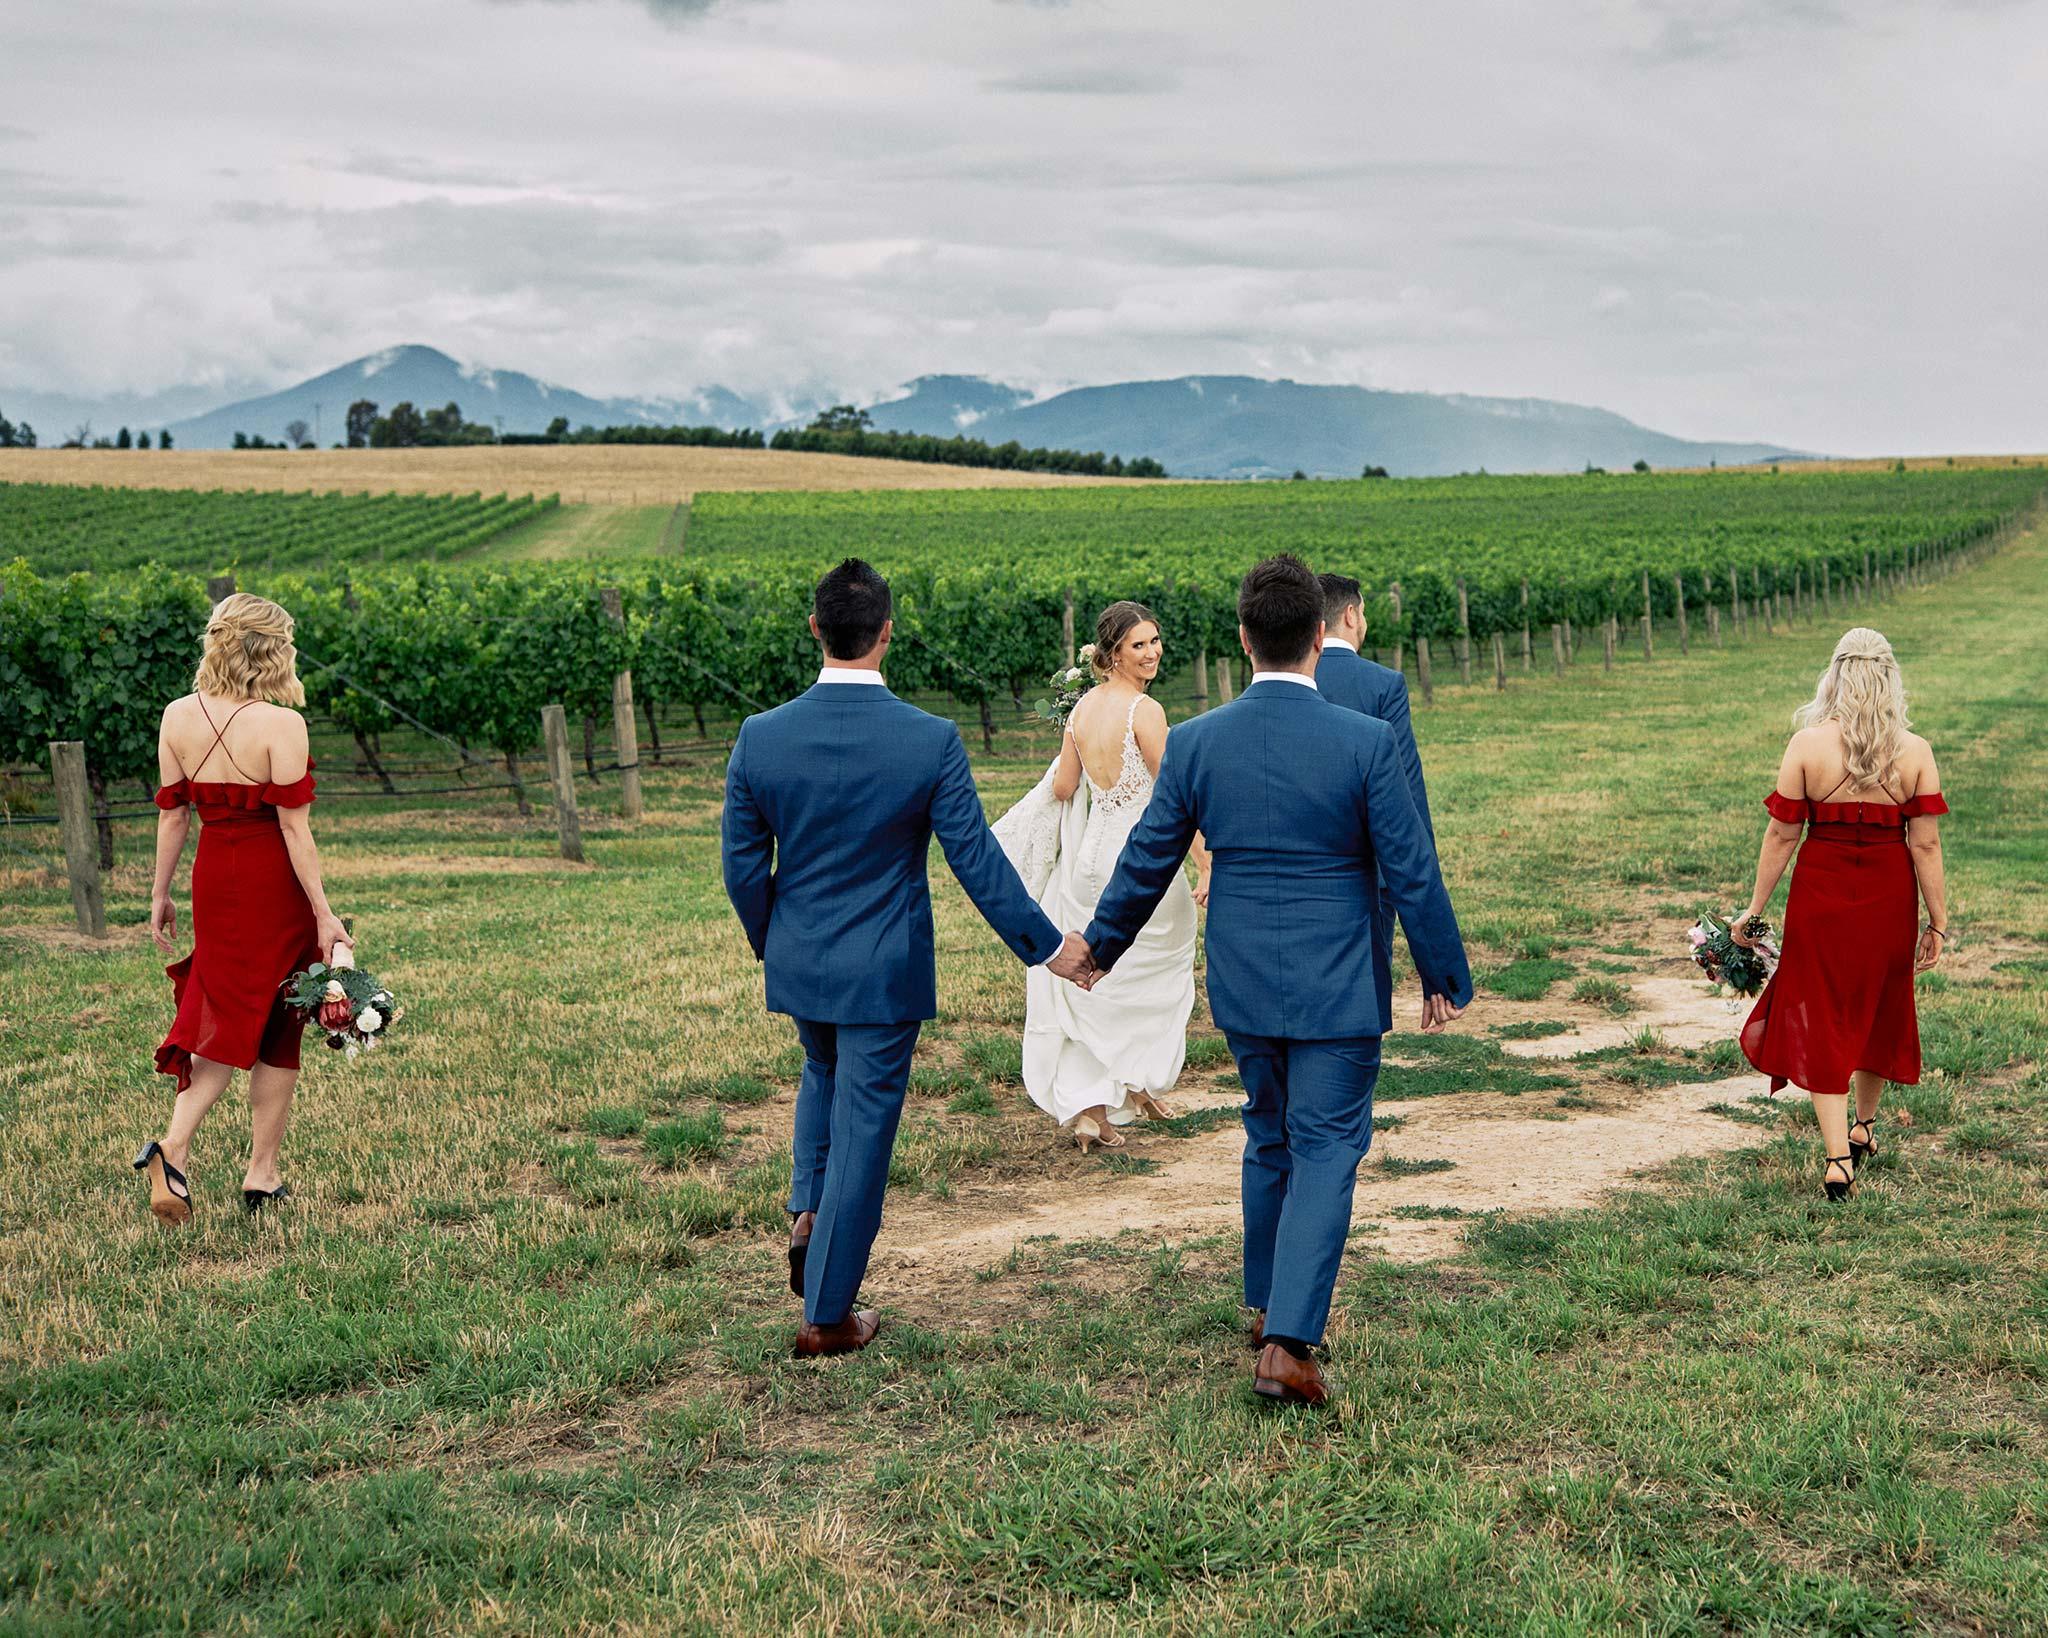 Zonzo estate wedding bridal party vineyard